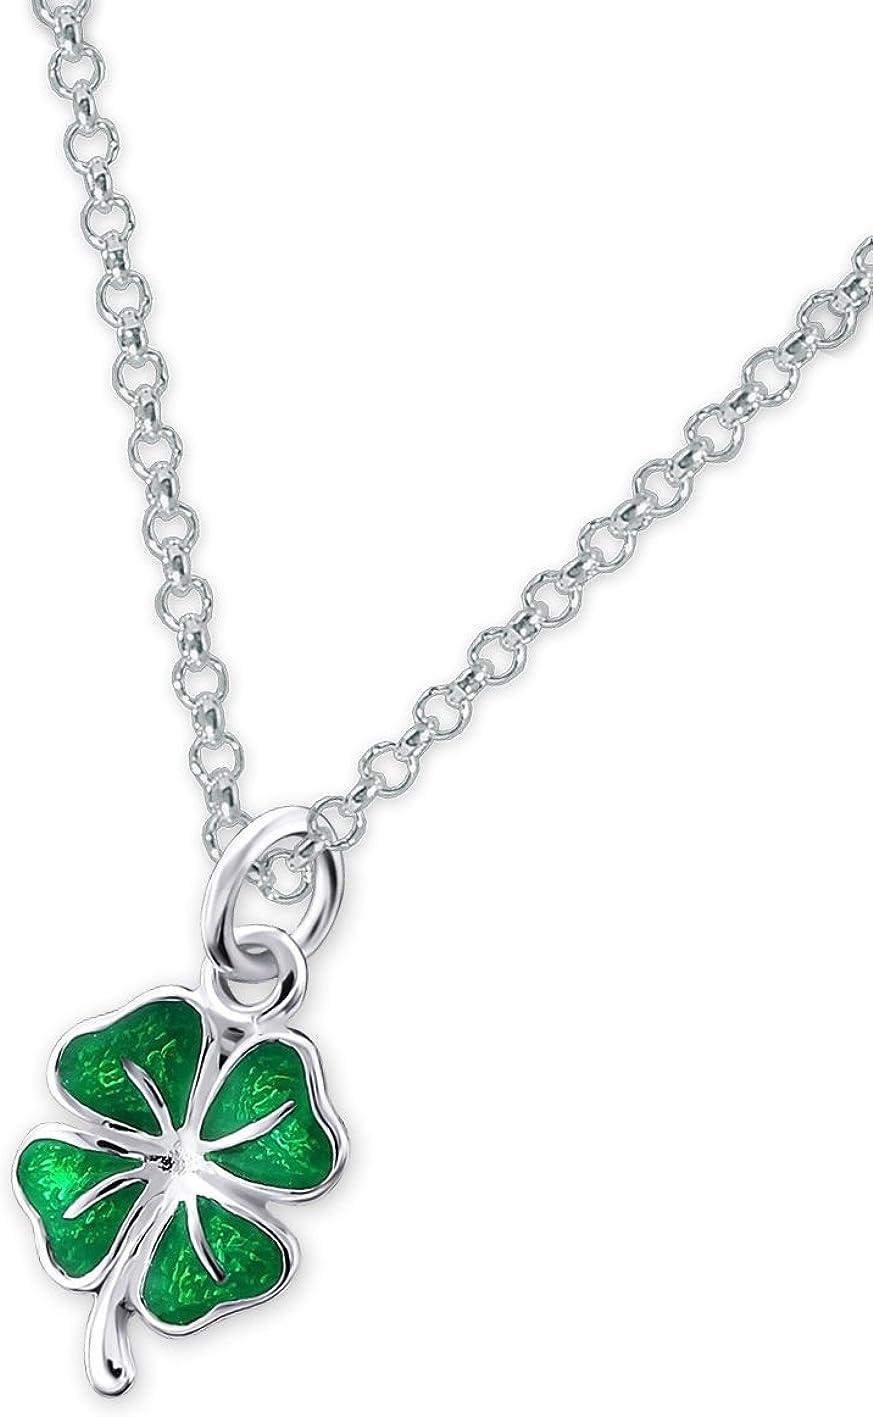 Laimons Colgantes con collar para mujer Trébol Brillante Verde Plata de ley 925